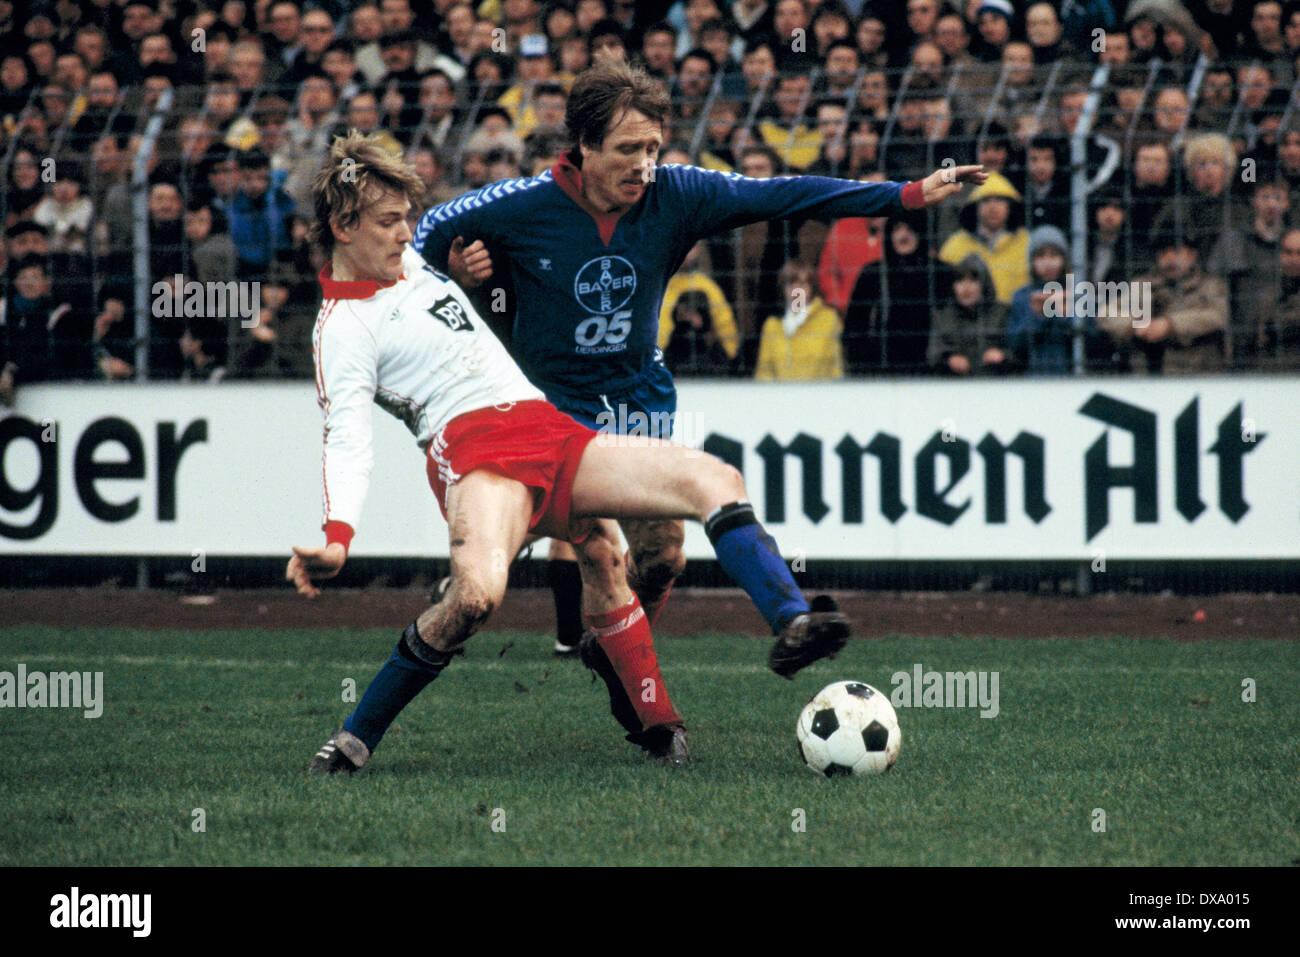 football, Bundesliga, 1980/1981, Grotenburg Stadium, FC Bayer 05 Uerdingen versus Hamburger SV 0:3, scene of the match, Holger Hieronymus (HSV) left and Siegfried Held (Bayer) - Stock Image